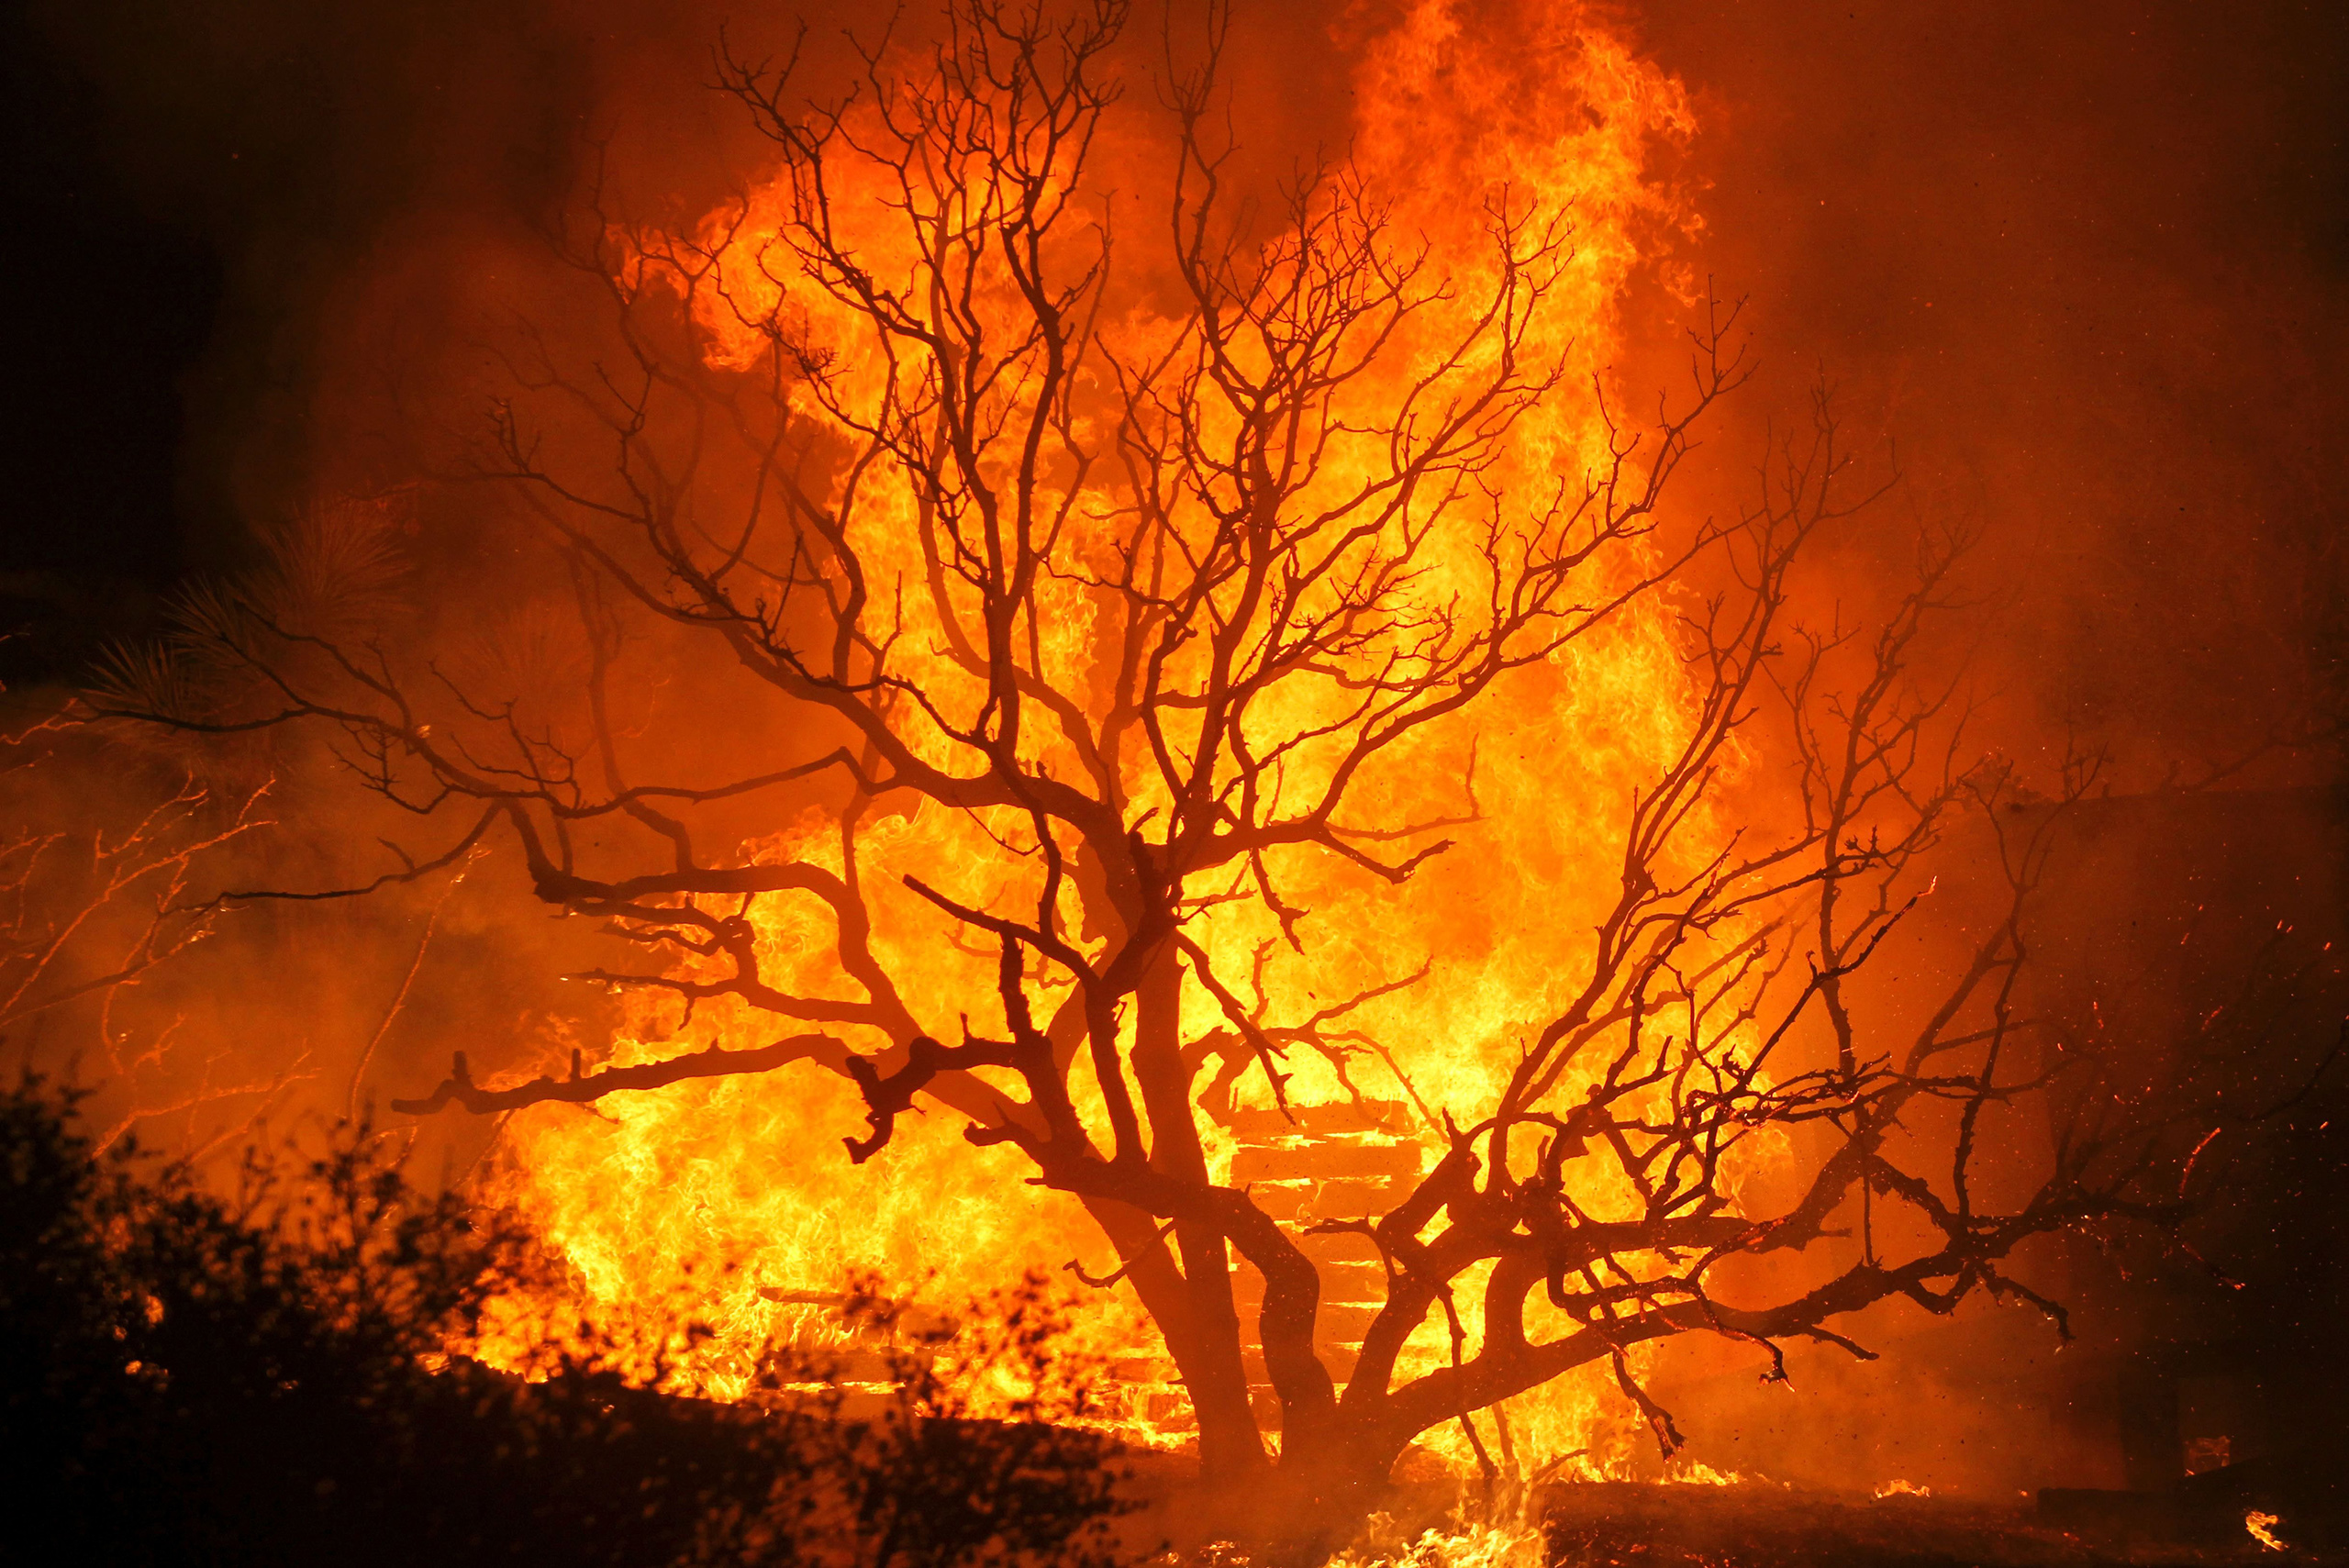 The Blue Cut wildfire burns structures and trees near Cajon Pass, north of San Bernardino, Calif., Aug. 16, 2016.